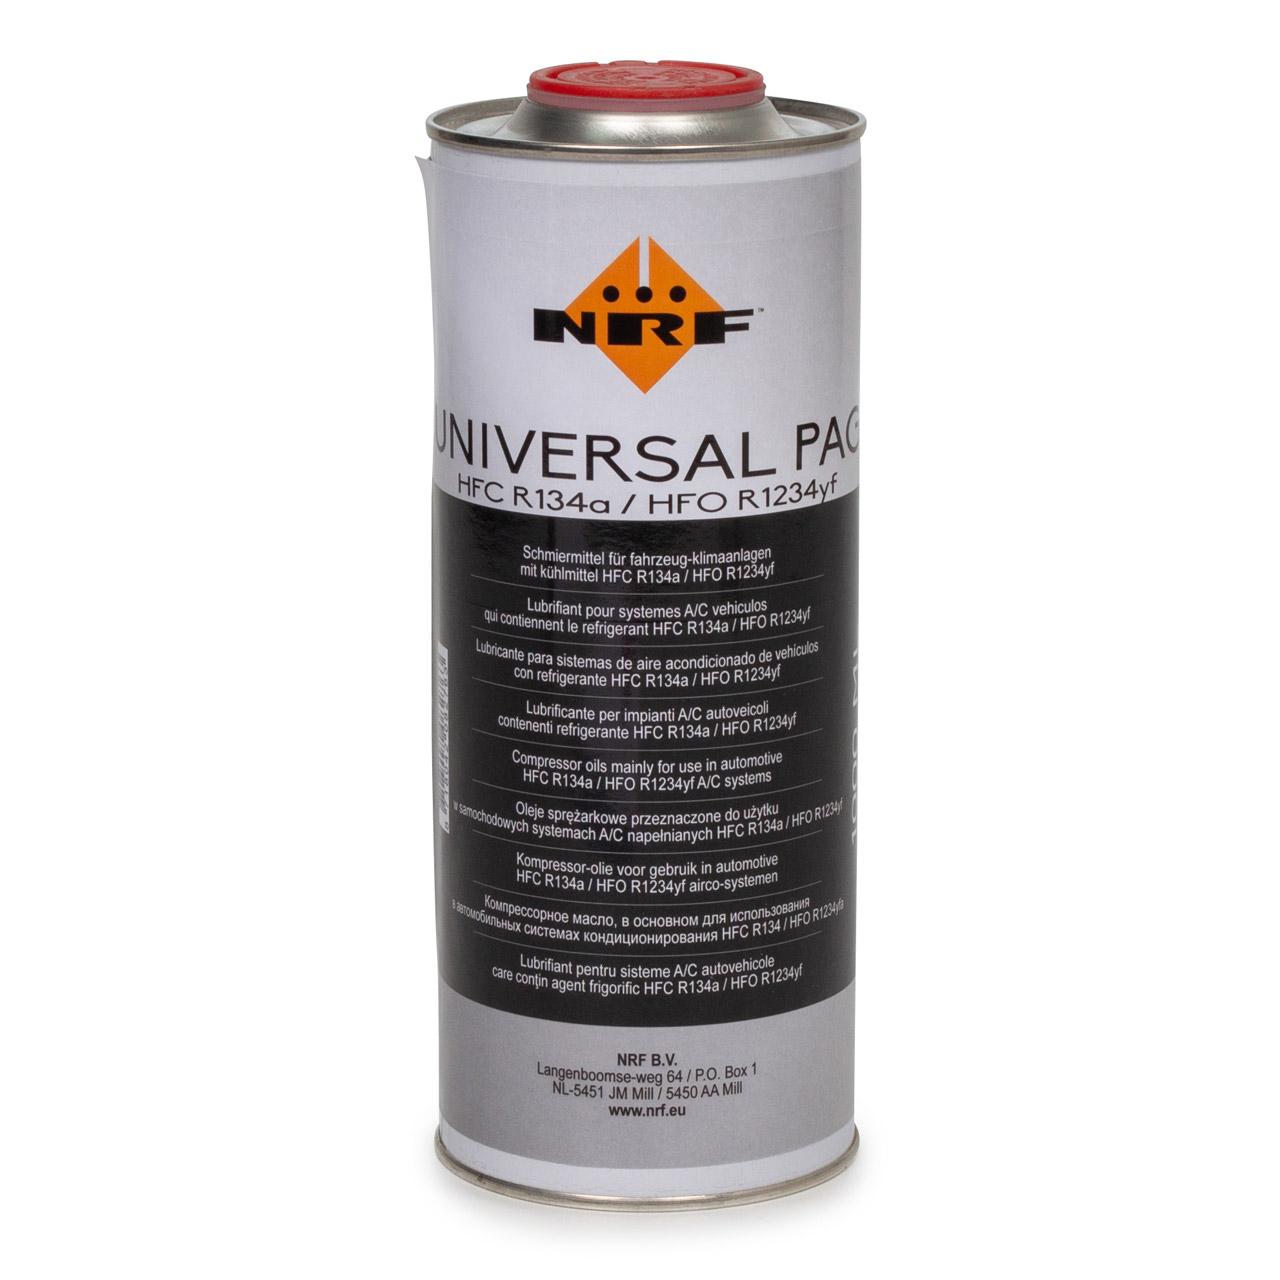 NRF 38832 Kompressor Öl Kompressoröl PAG 46 HFC R134a HFO R1234yf 1000ml 1 Liter